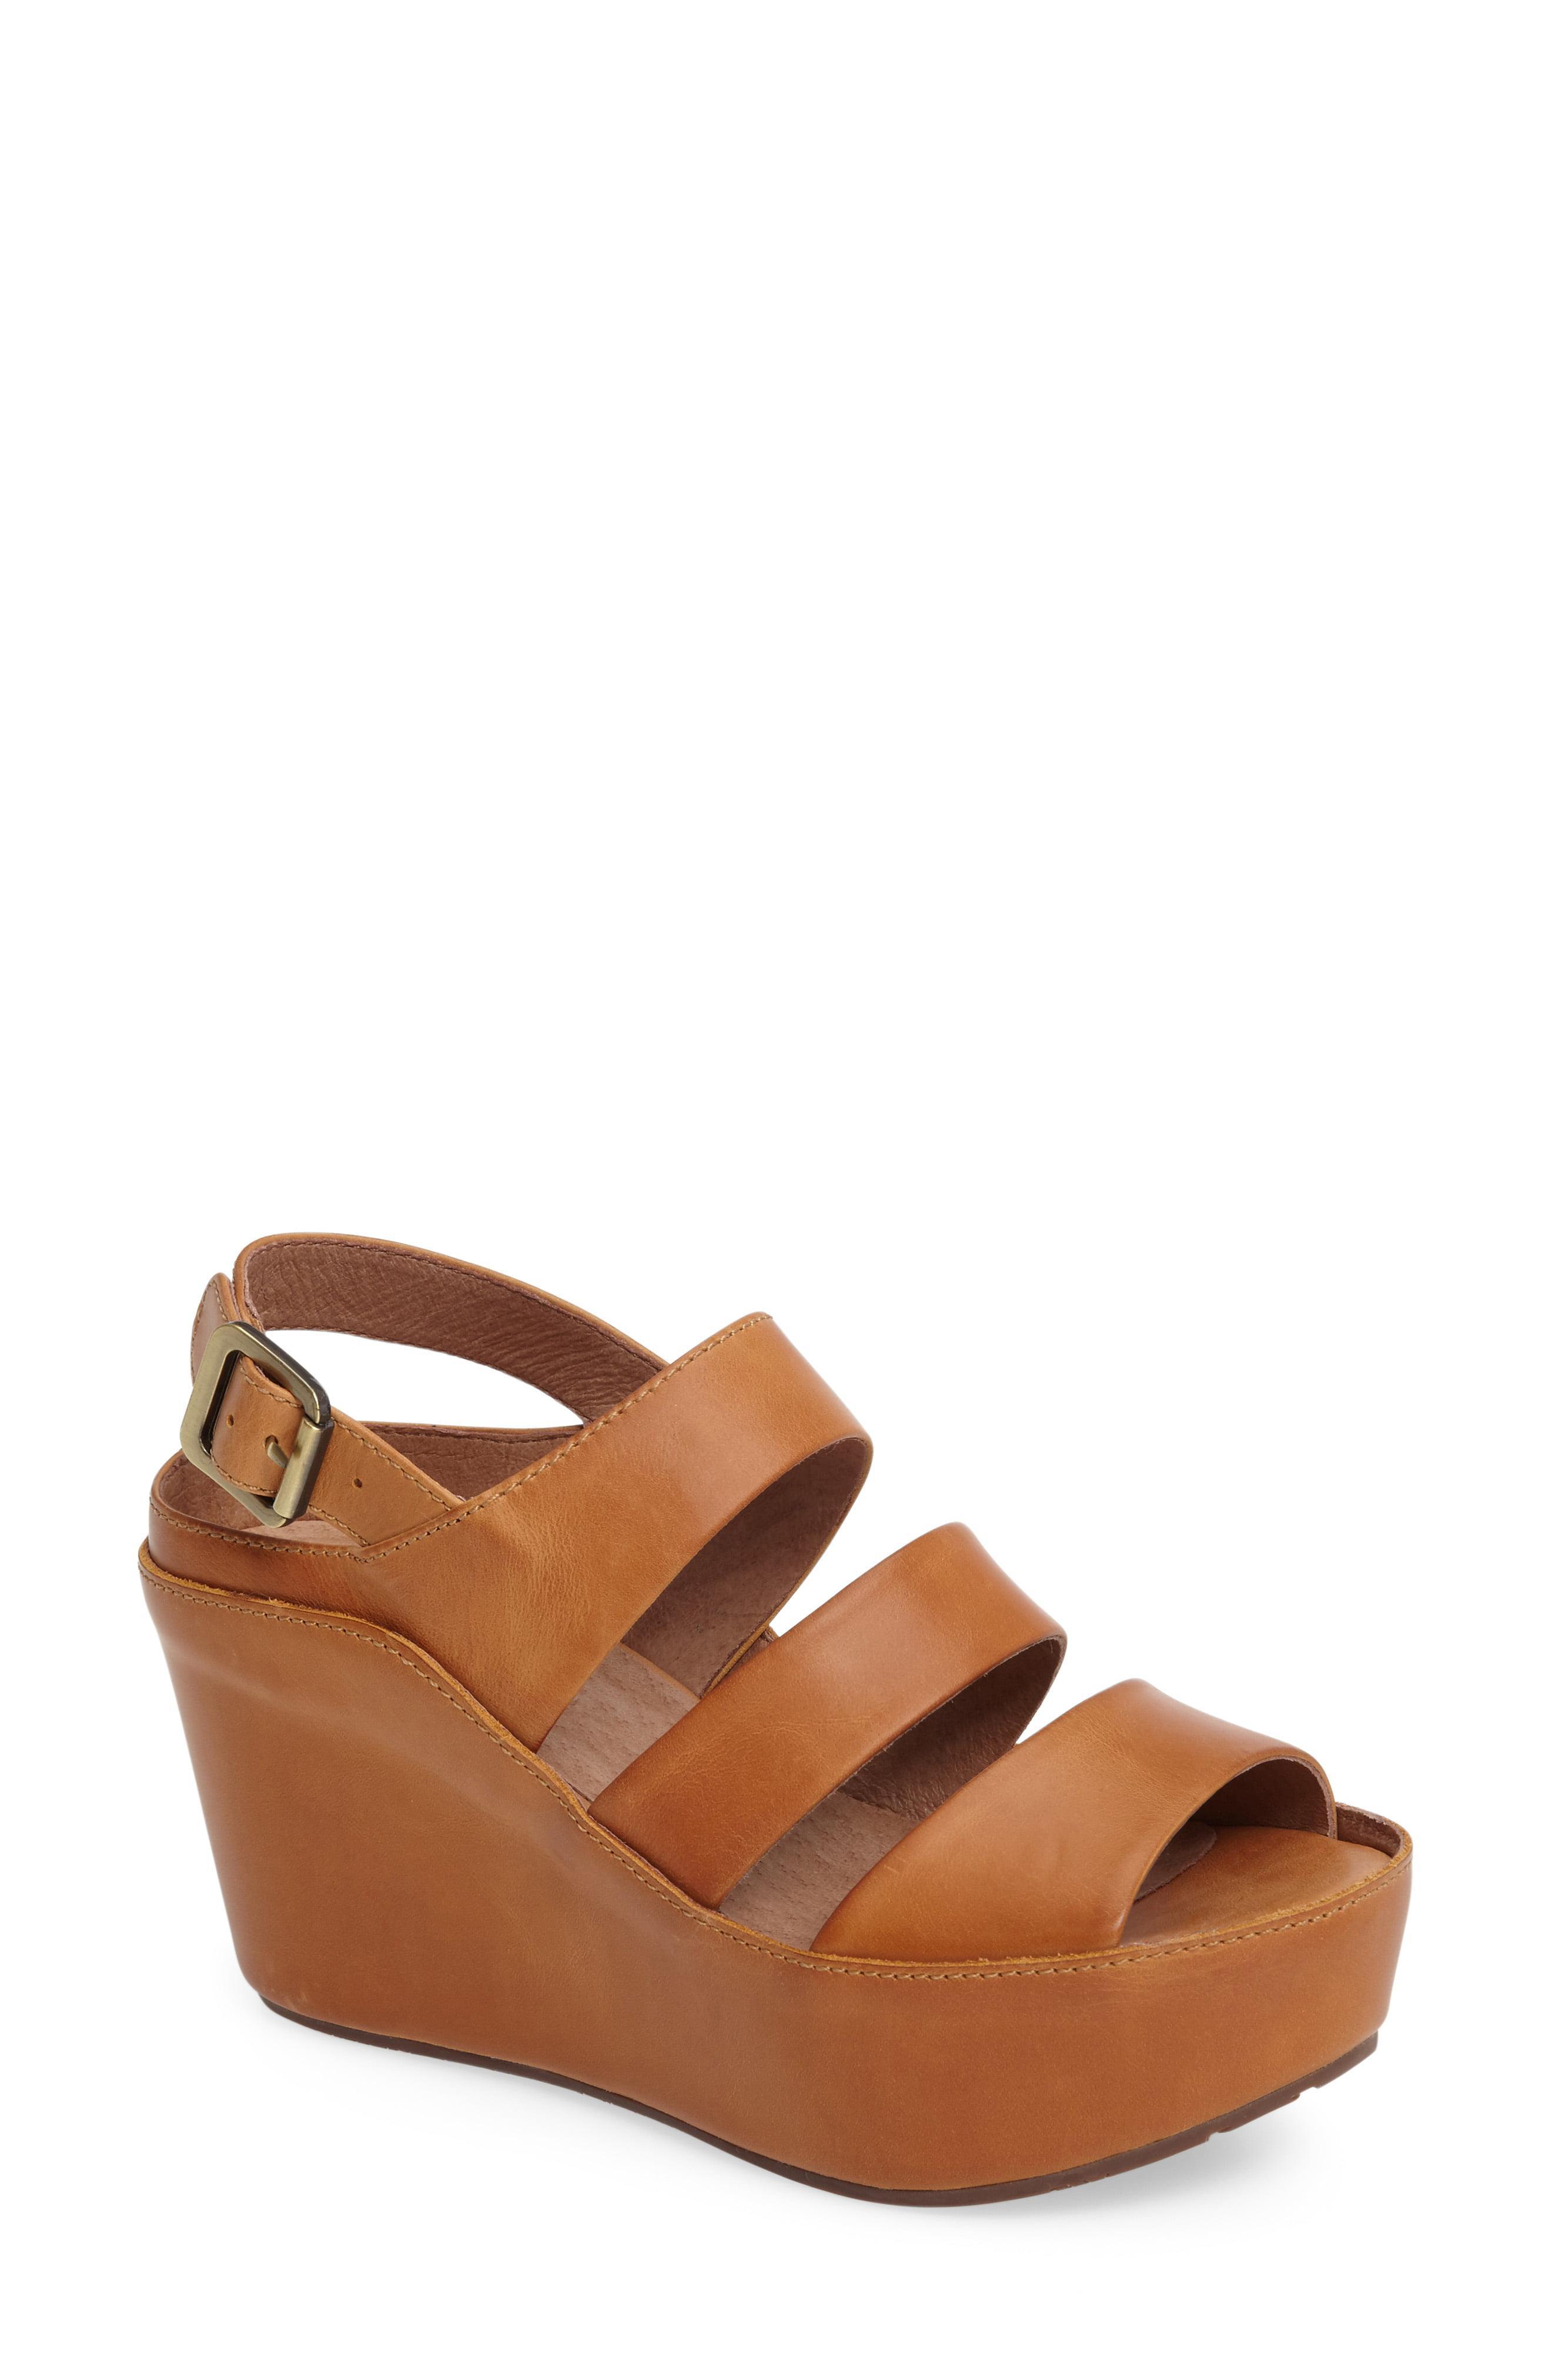 15805507b59f Lyst - Chocolat Blu Windsor Platform Wedge Sandal in Brown